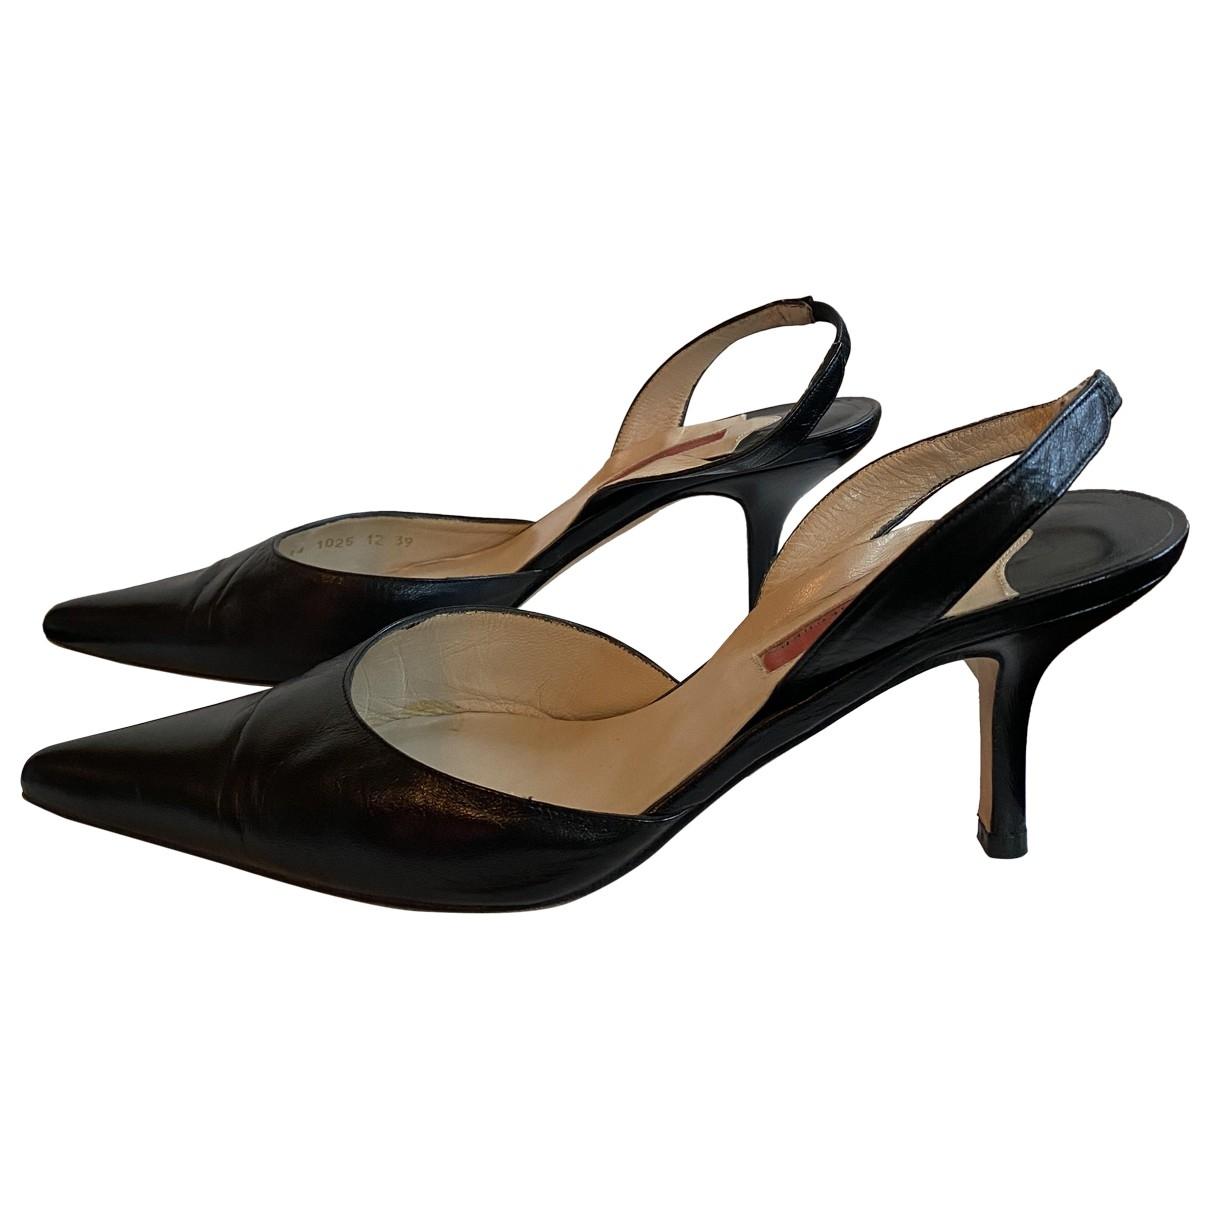 Carolina Herrera \N Black Leather Heels for Women 39 EU